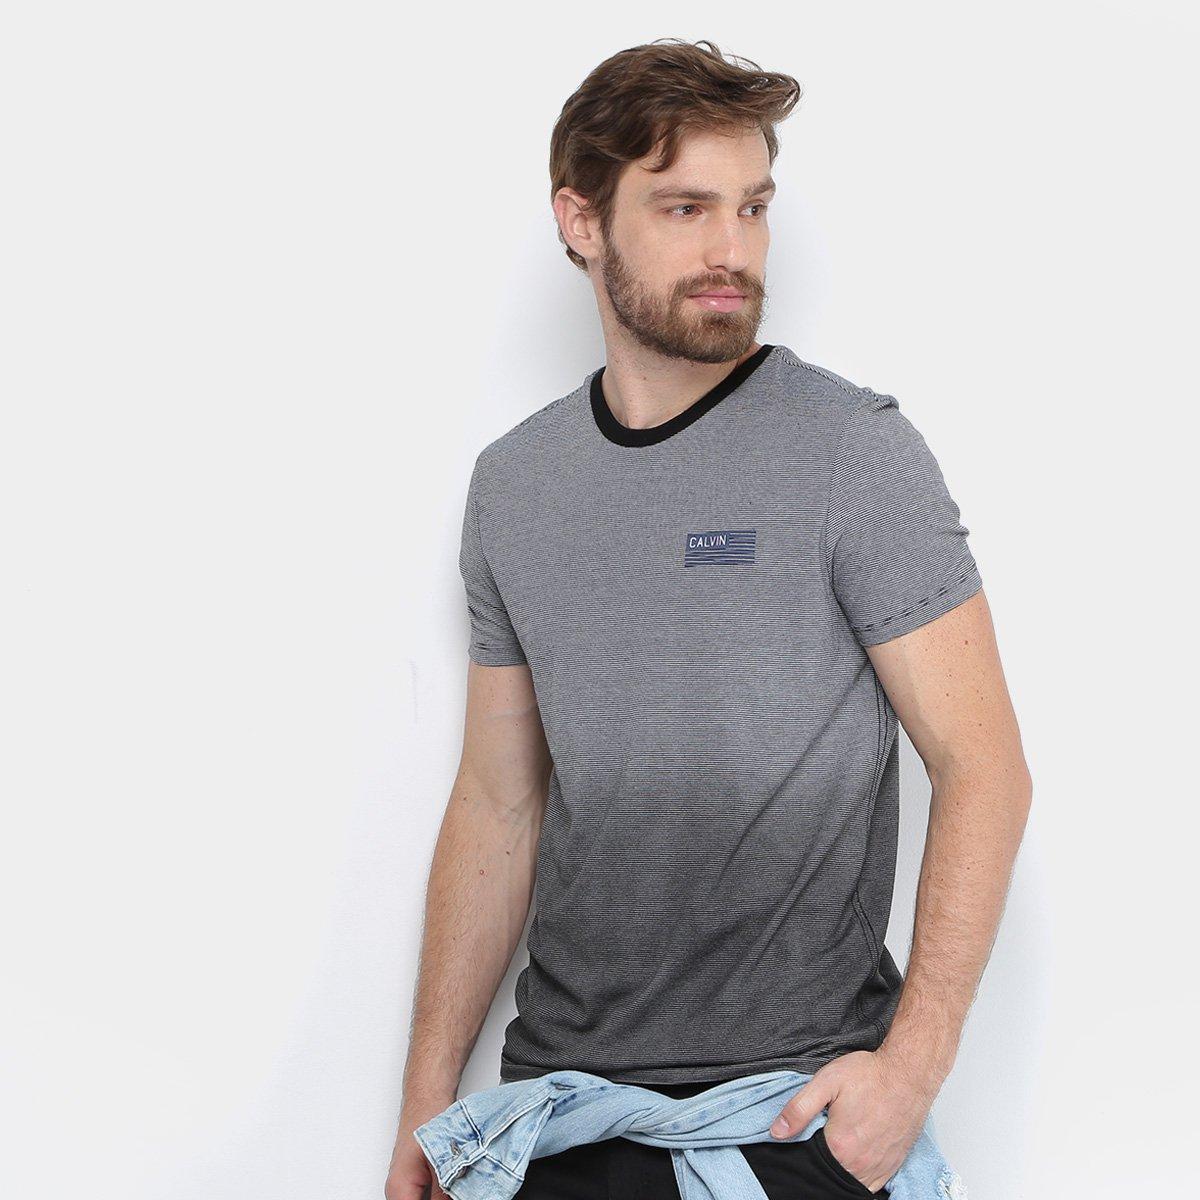 b32f476571d9f Camiseta Calvin Klein Listras Degradê Masculina - Compre Agora ...